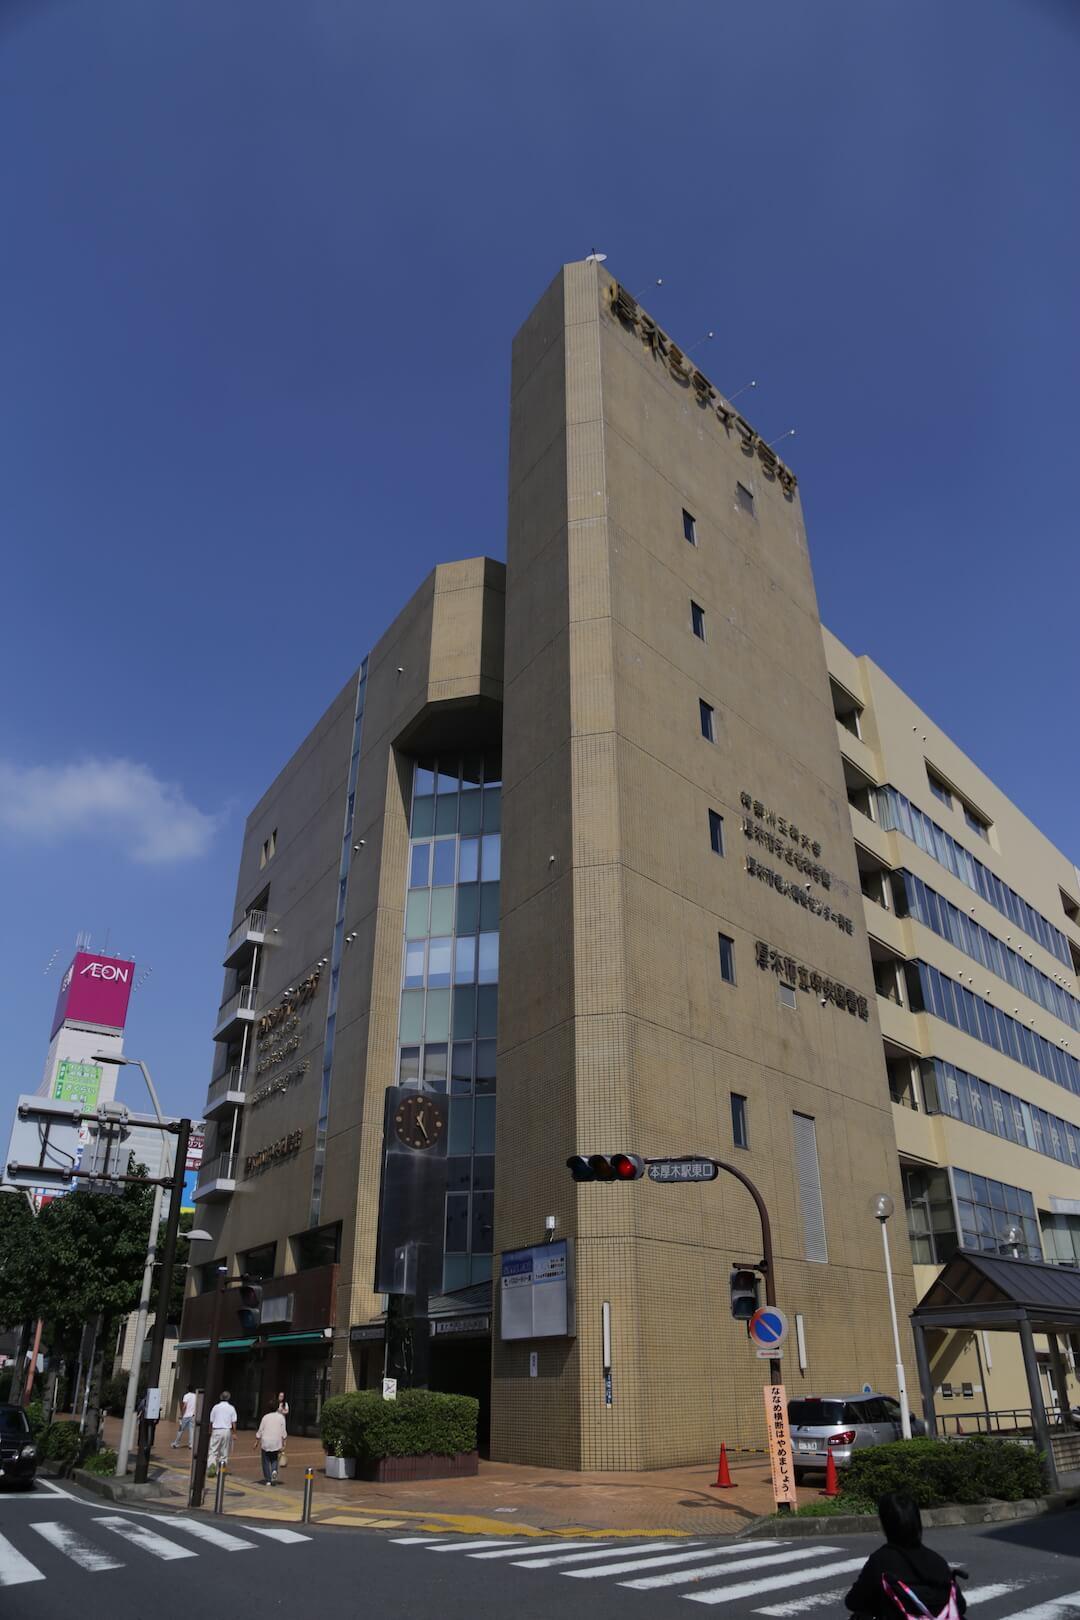 神奈川工科大学厚木市子ども科学館 外観